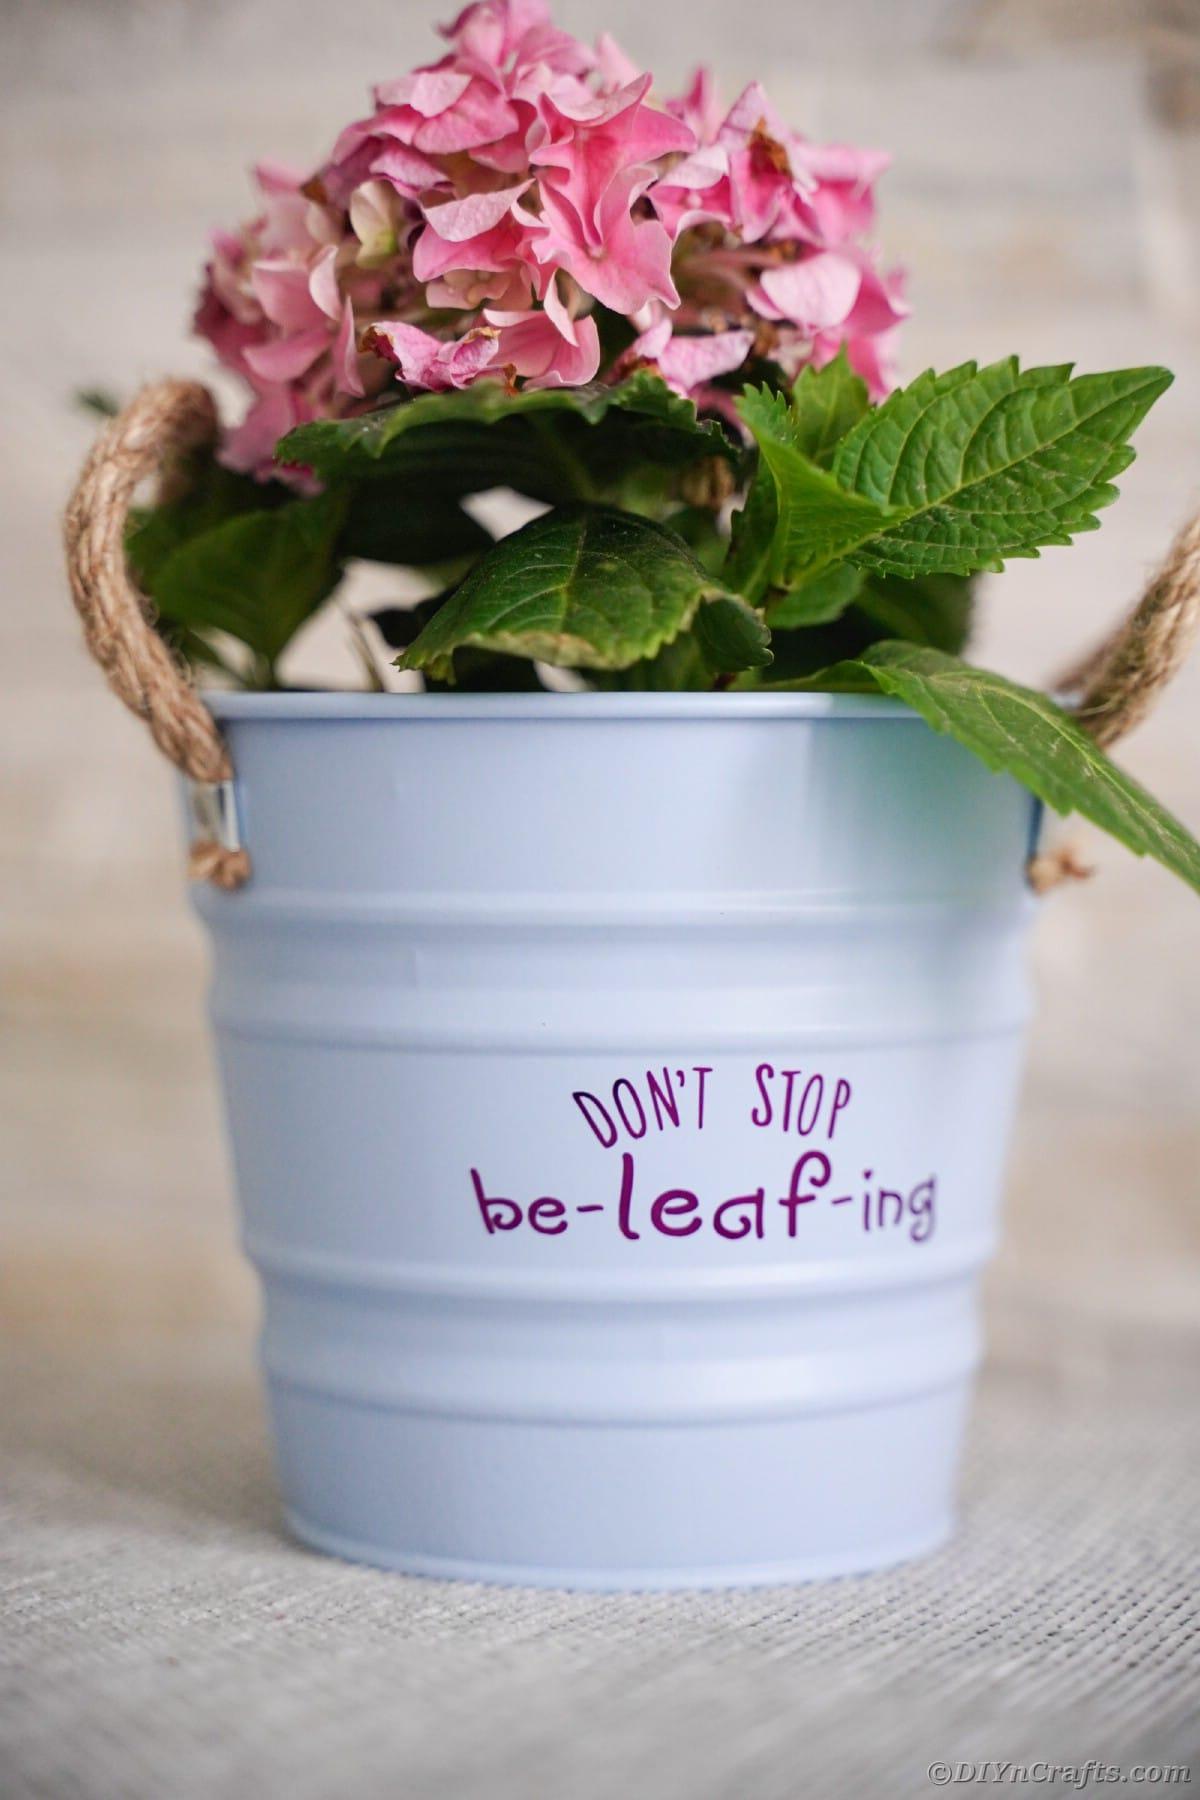 Light blue flower pot with purple message